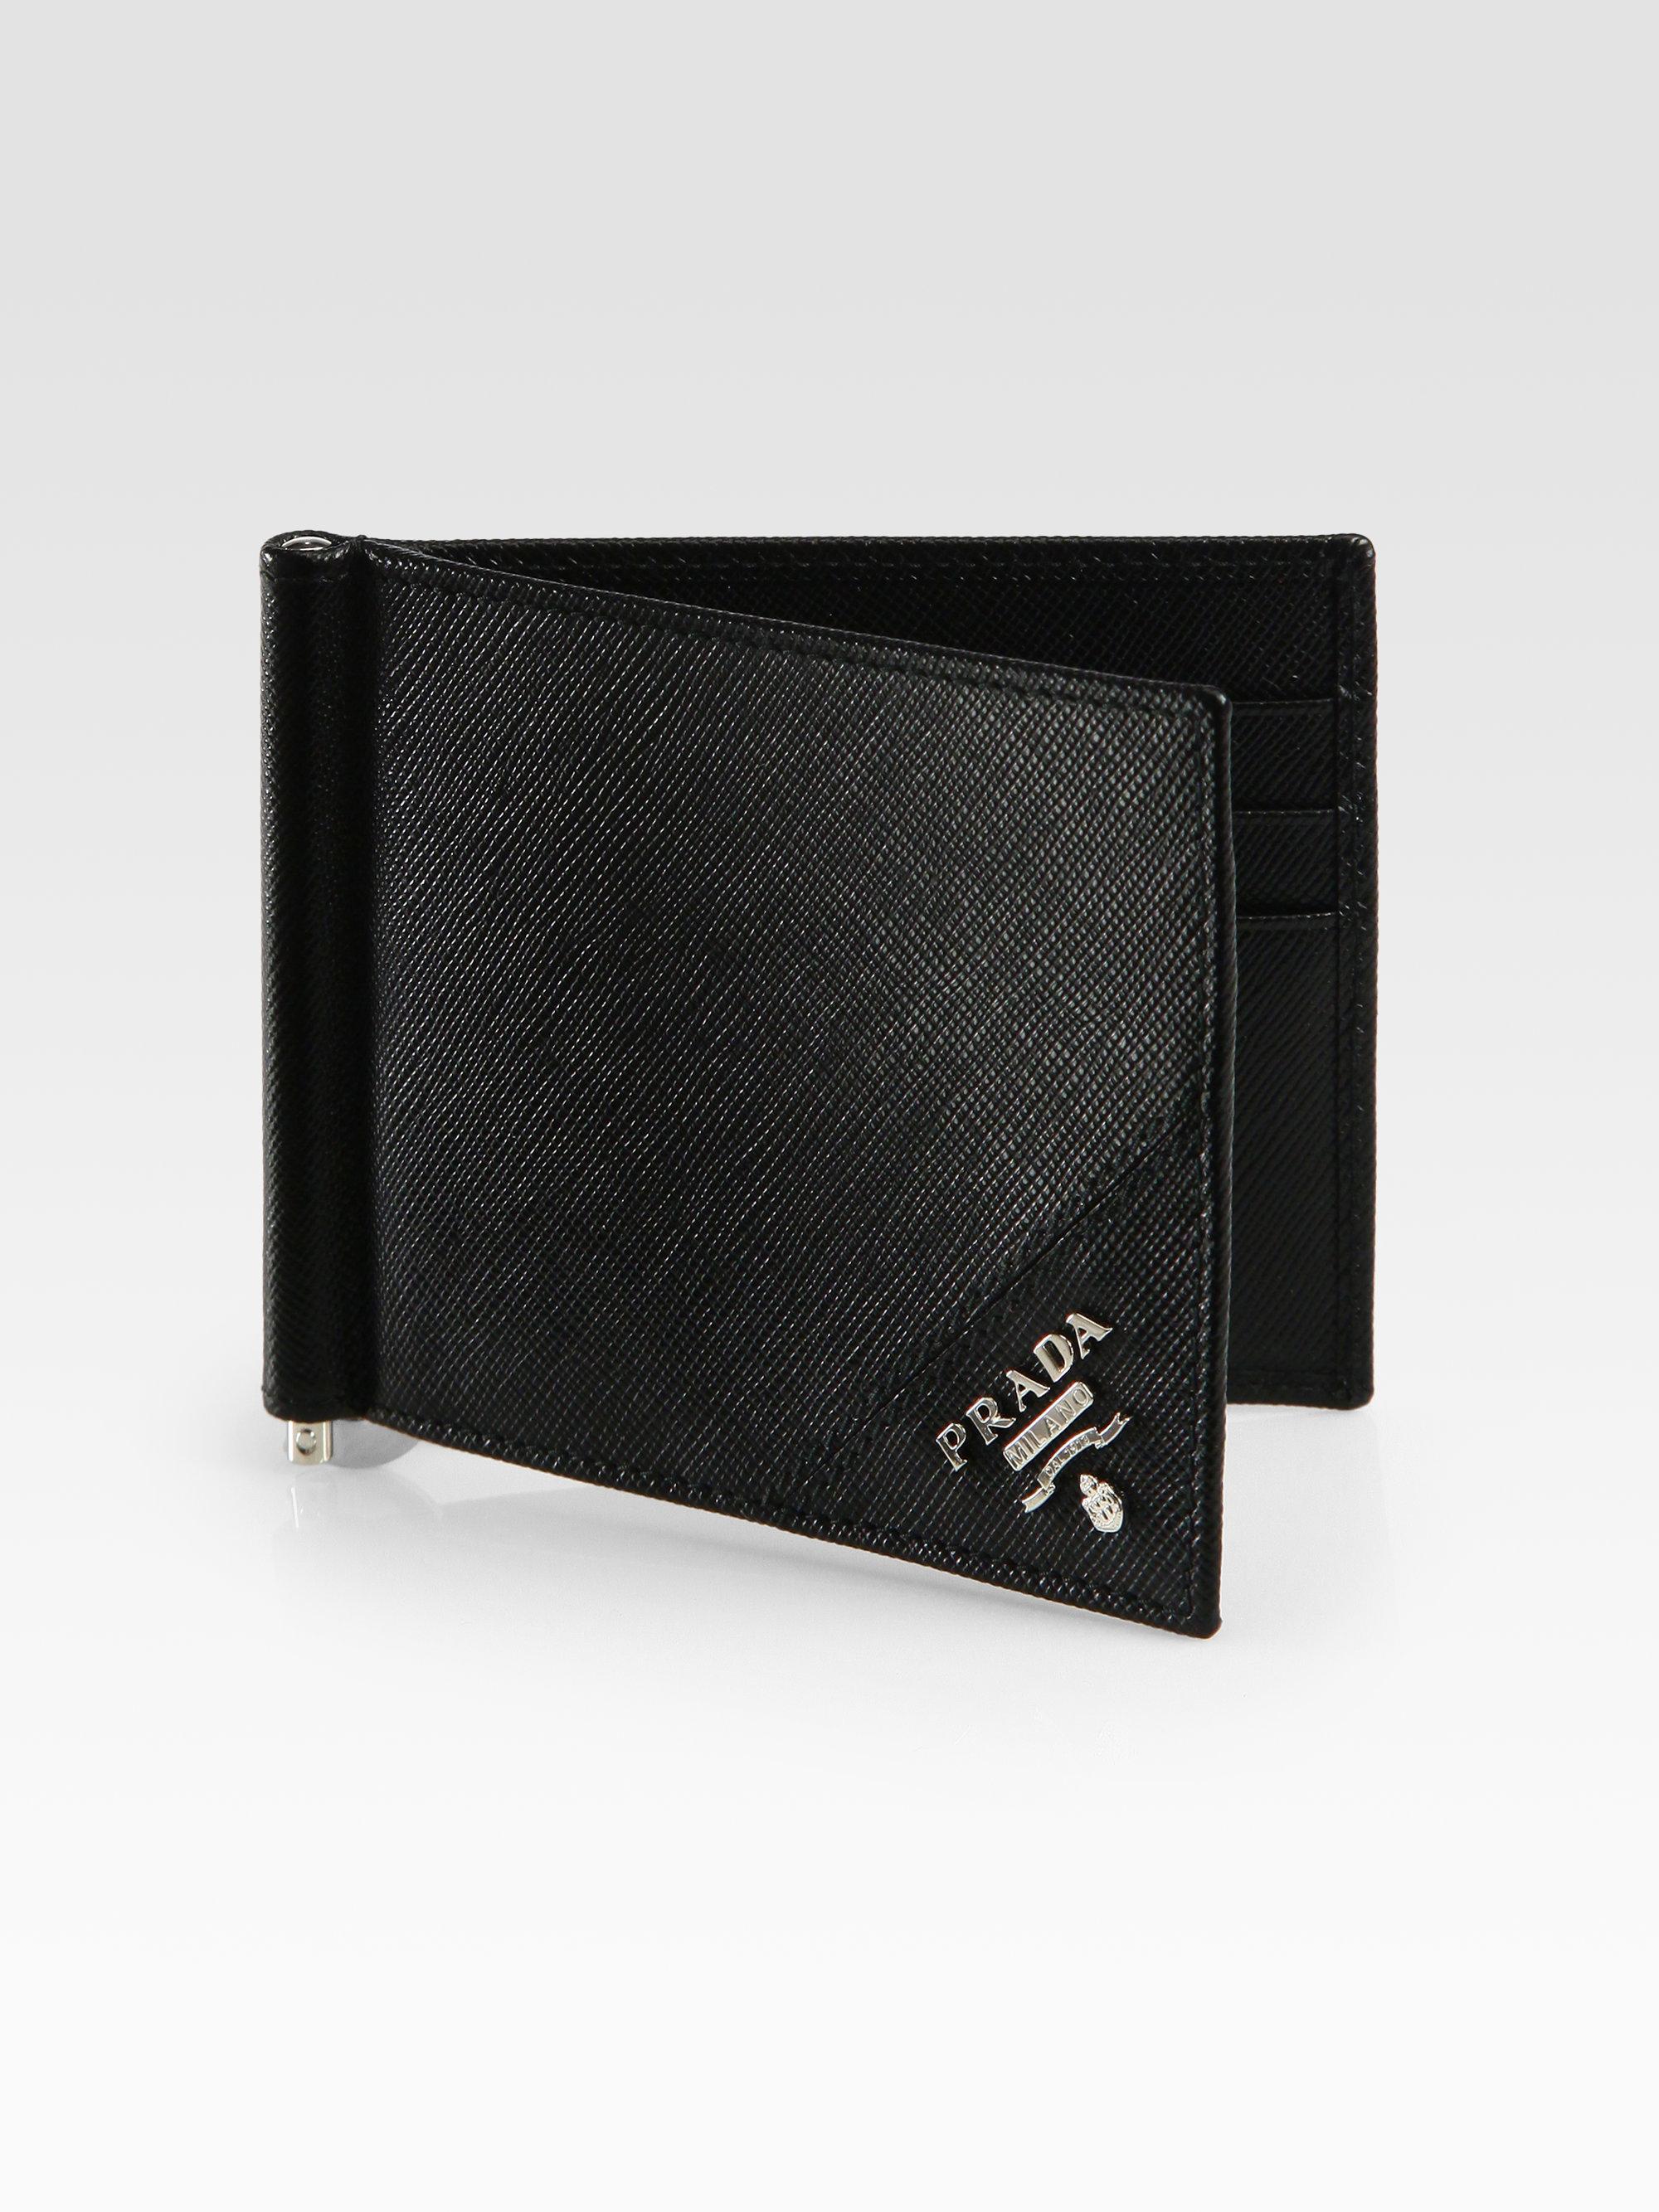 f8dc7b4fbee983 spain prada money clip wallet for men cc8a4 5c78e